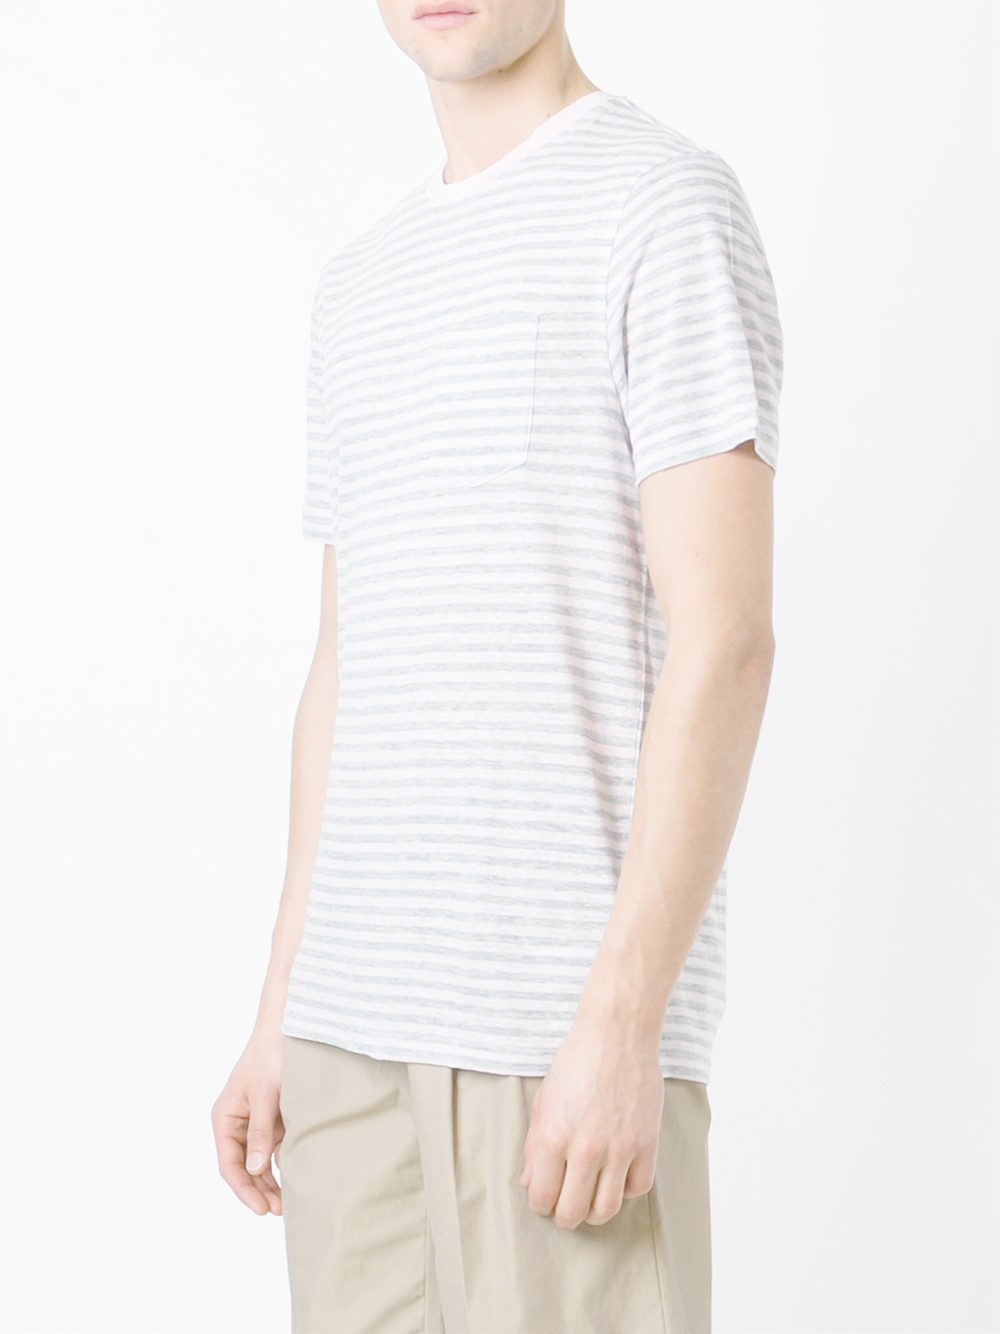 michael kors striped t shirt in gray for men lyst. Black Bedroom Furniture Sets. Home Design Ideas